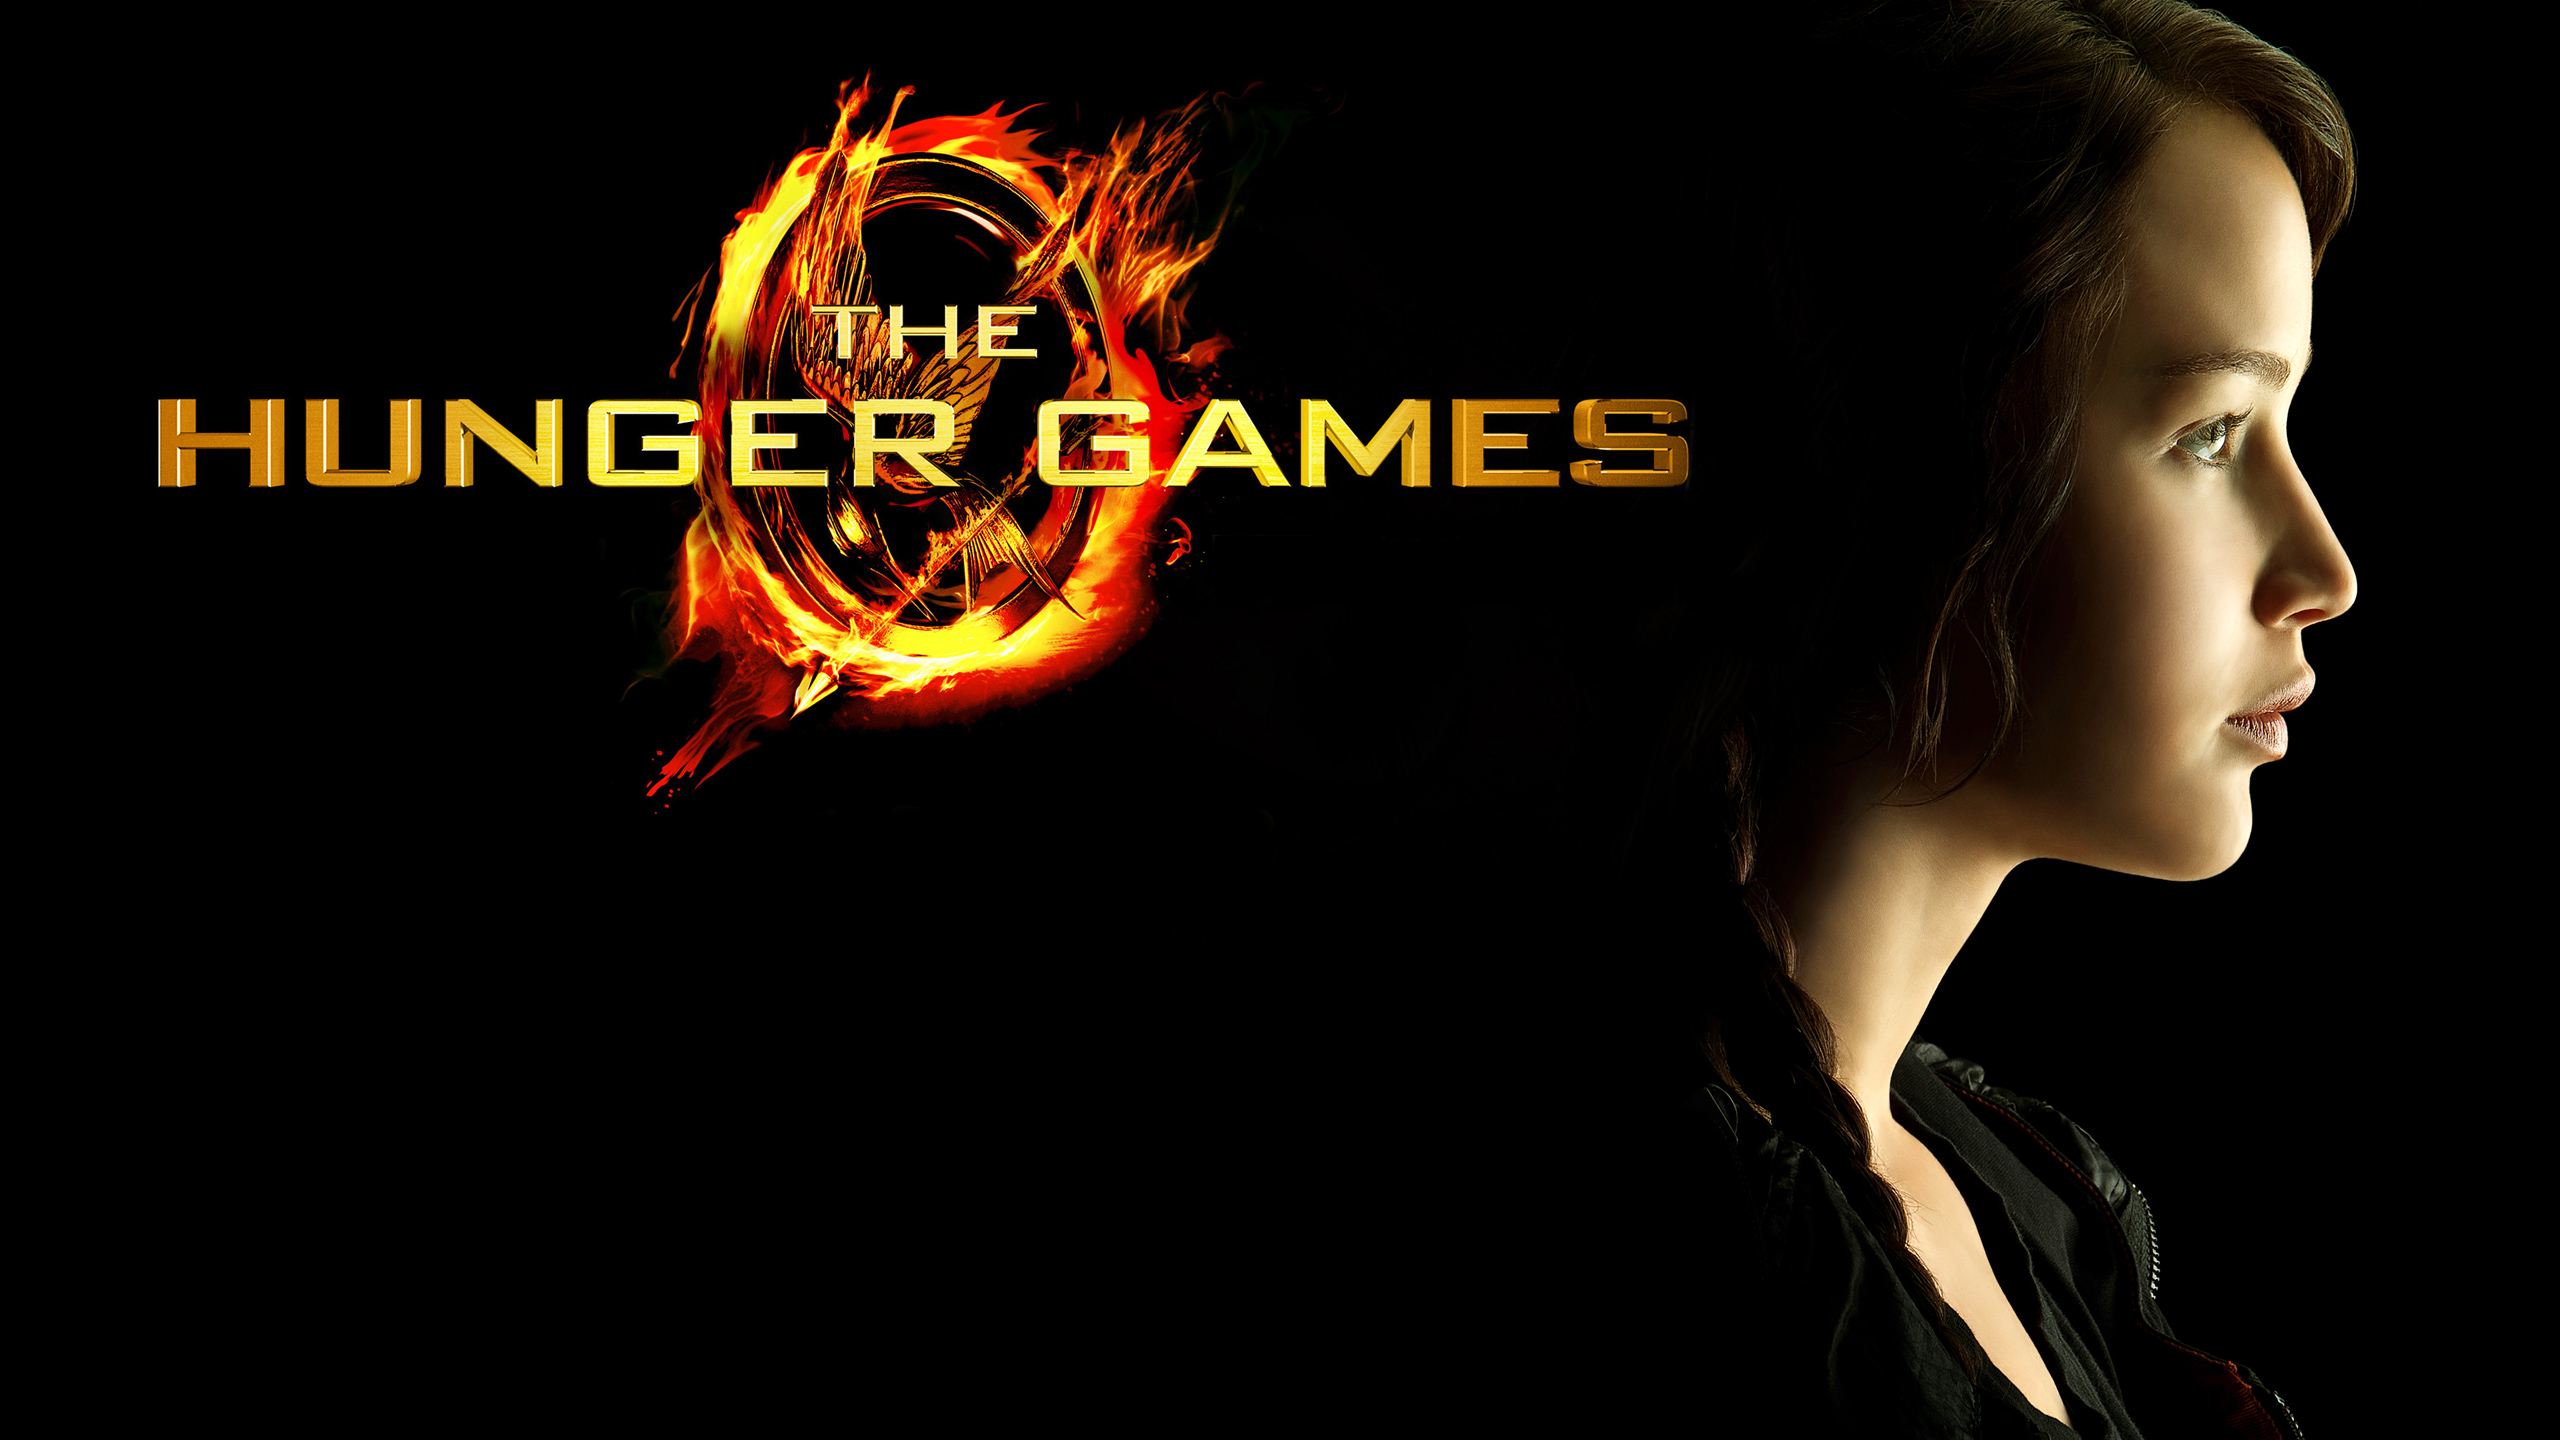 The Hunger Games Wallpapers Actualizado   Taringa 2560x1440